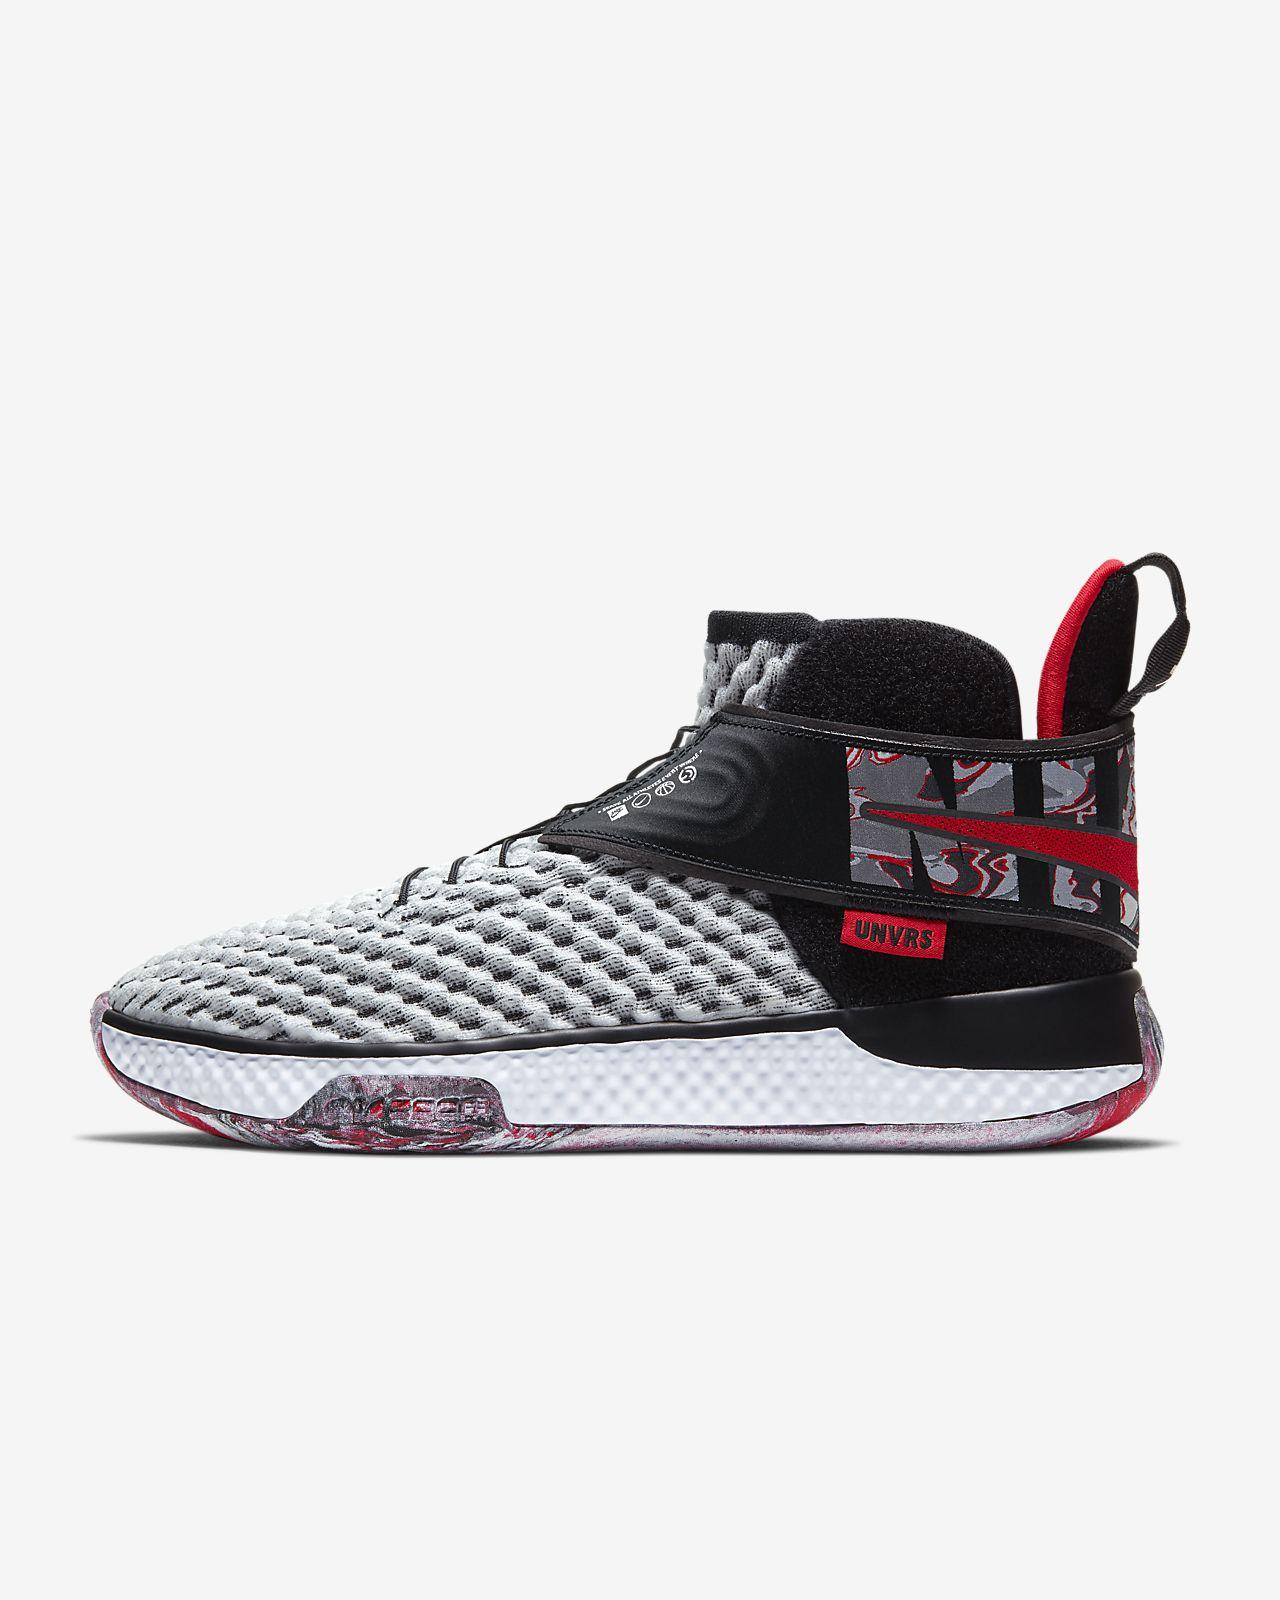 Nike Air Zoom UNVRS FlyEase Basketbalschoen